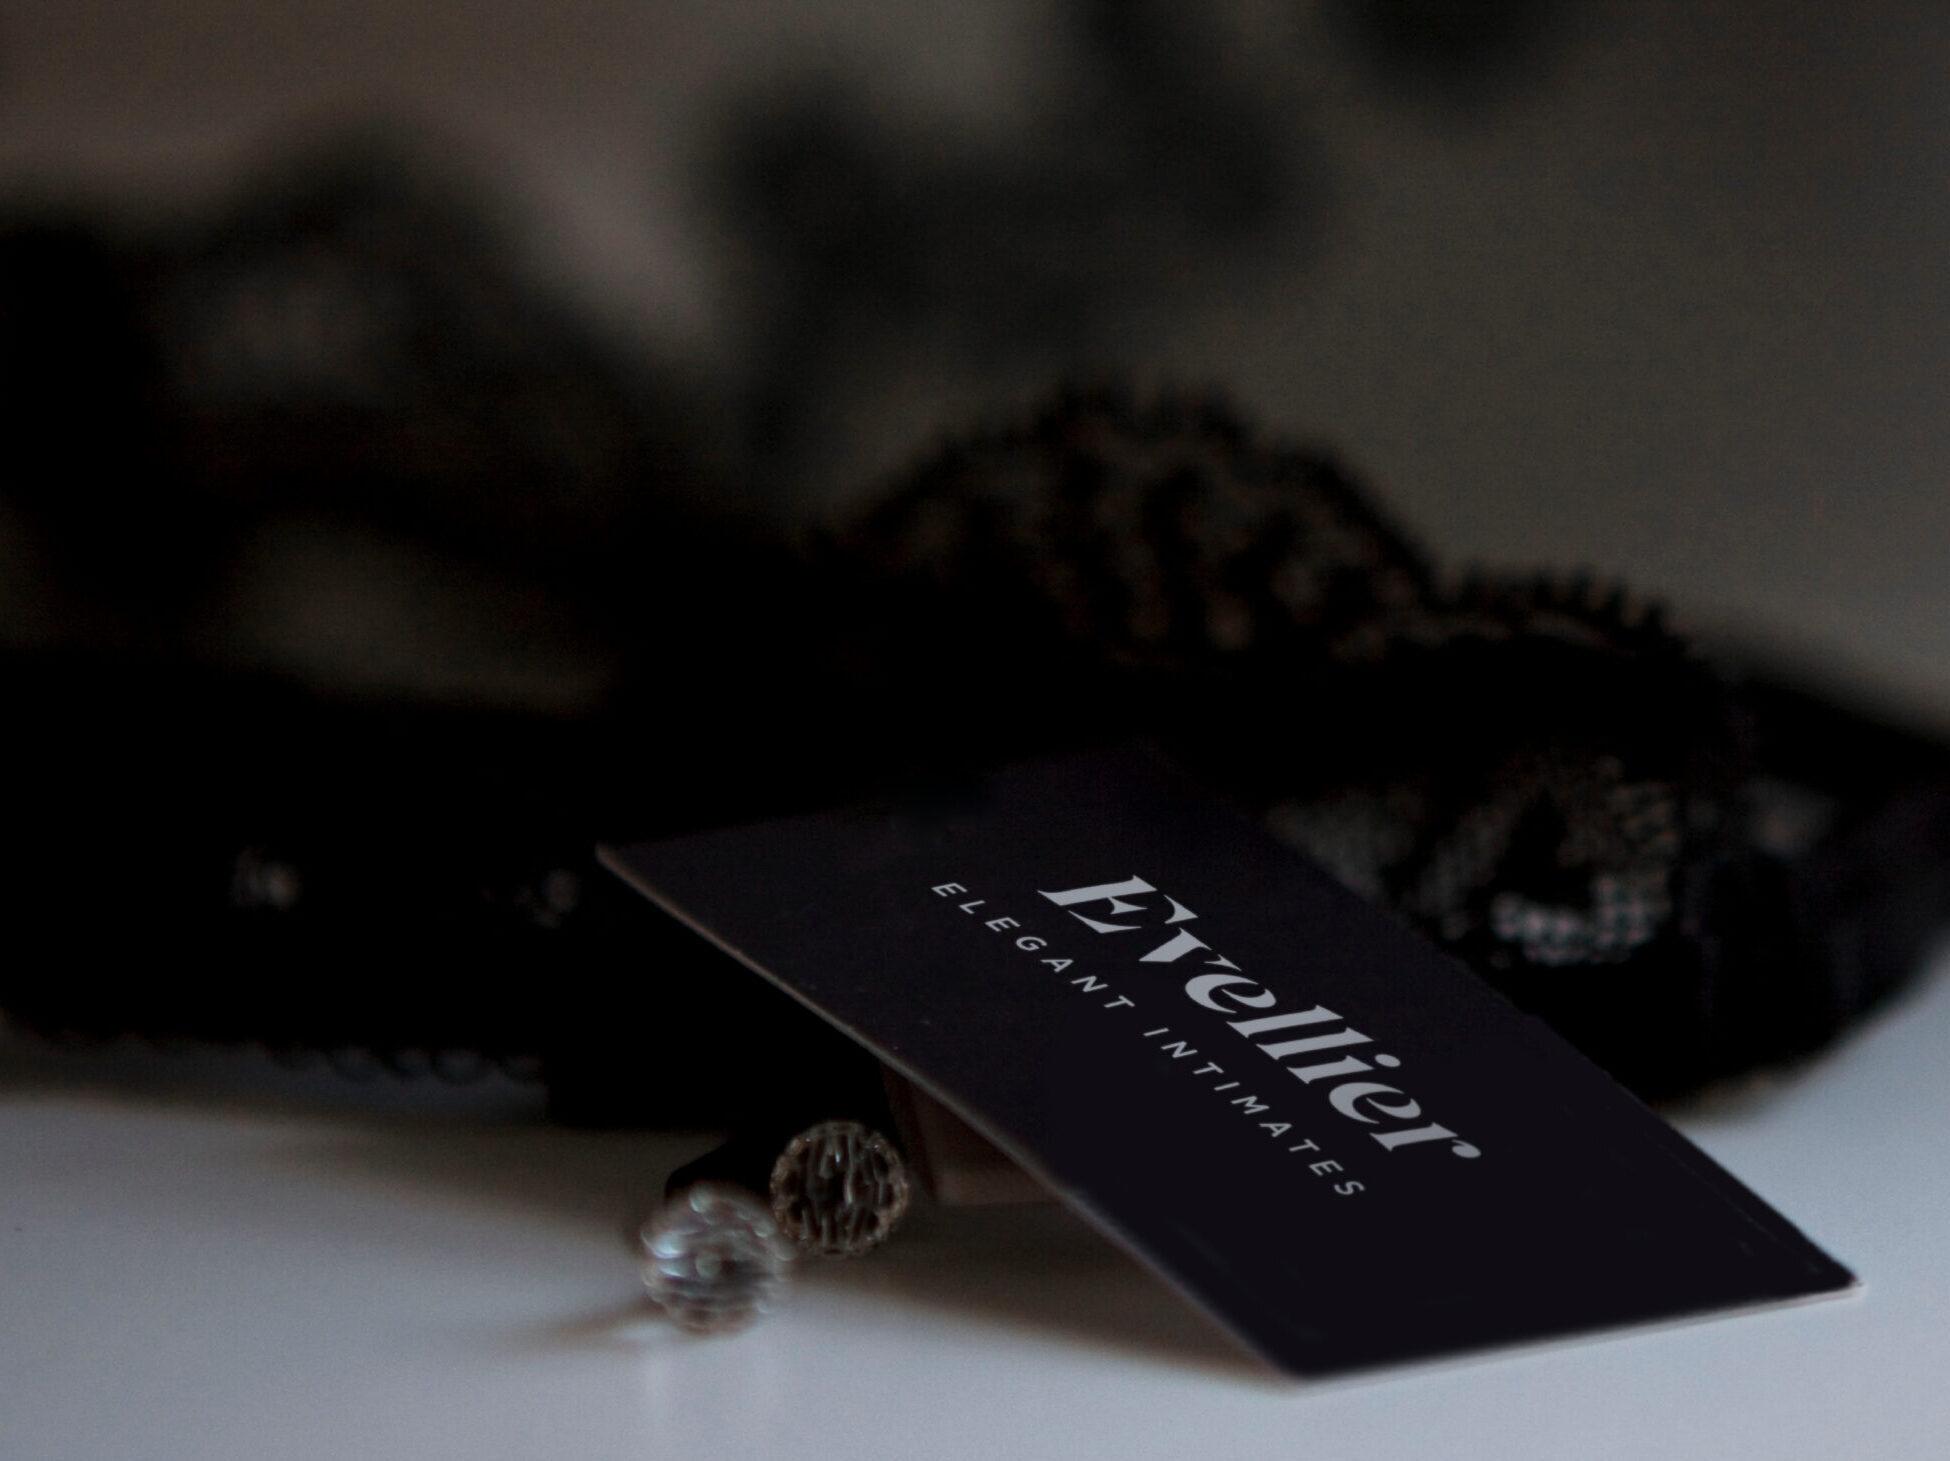 Evellier Elegant Intimates black business card